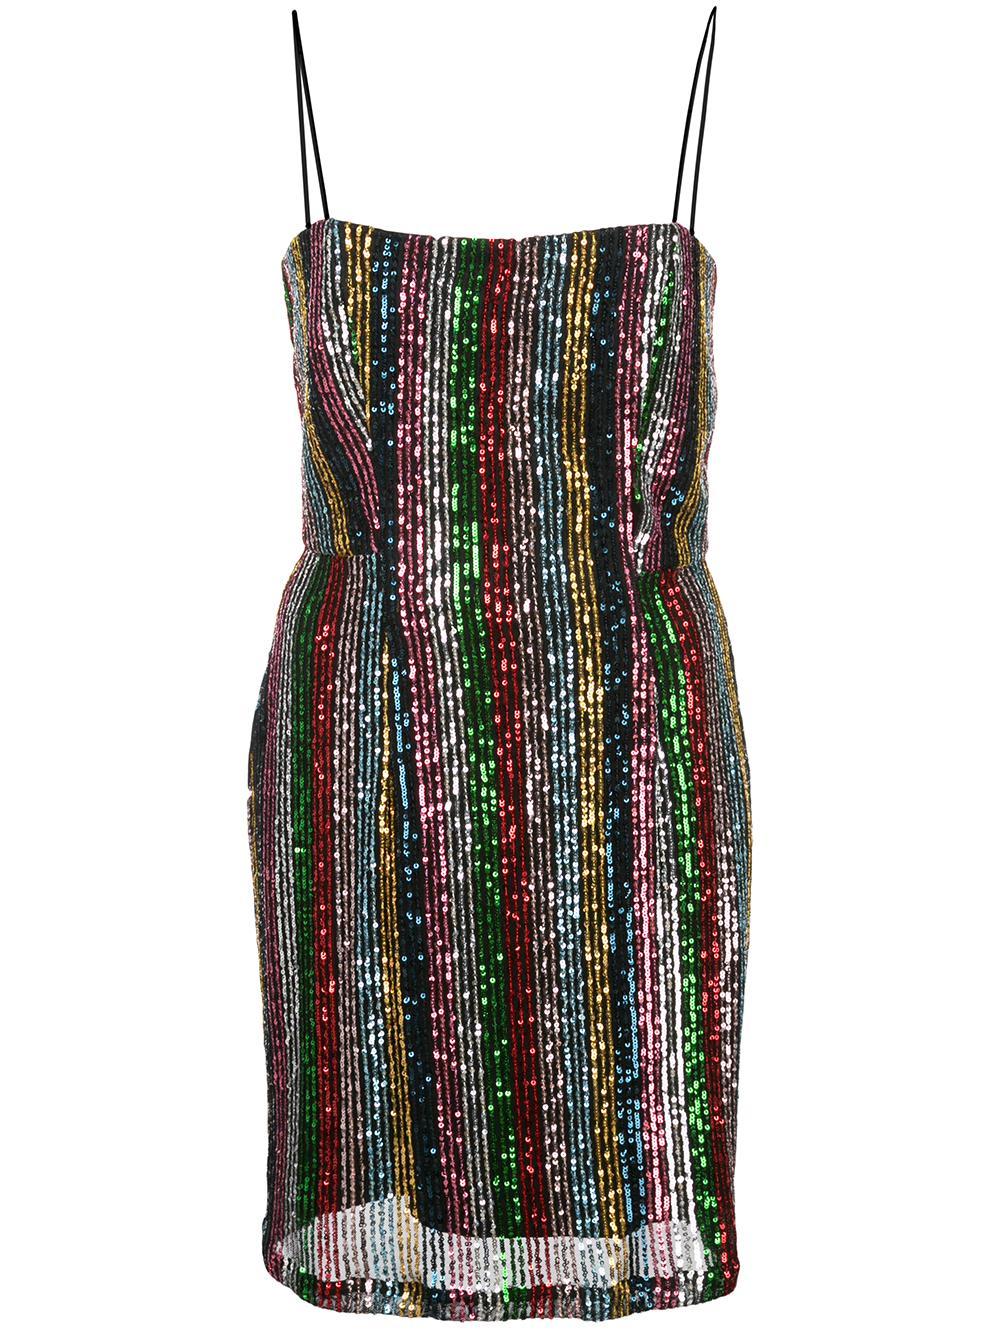 Kaia Sequin Mini Dress Item # 14933